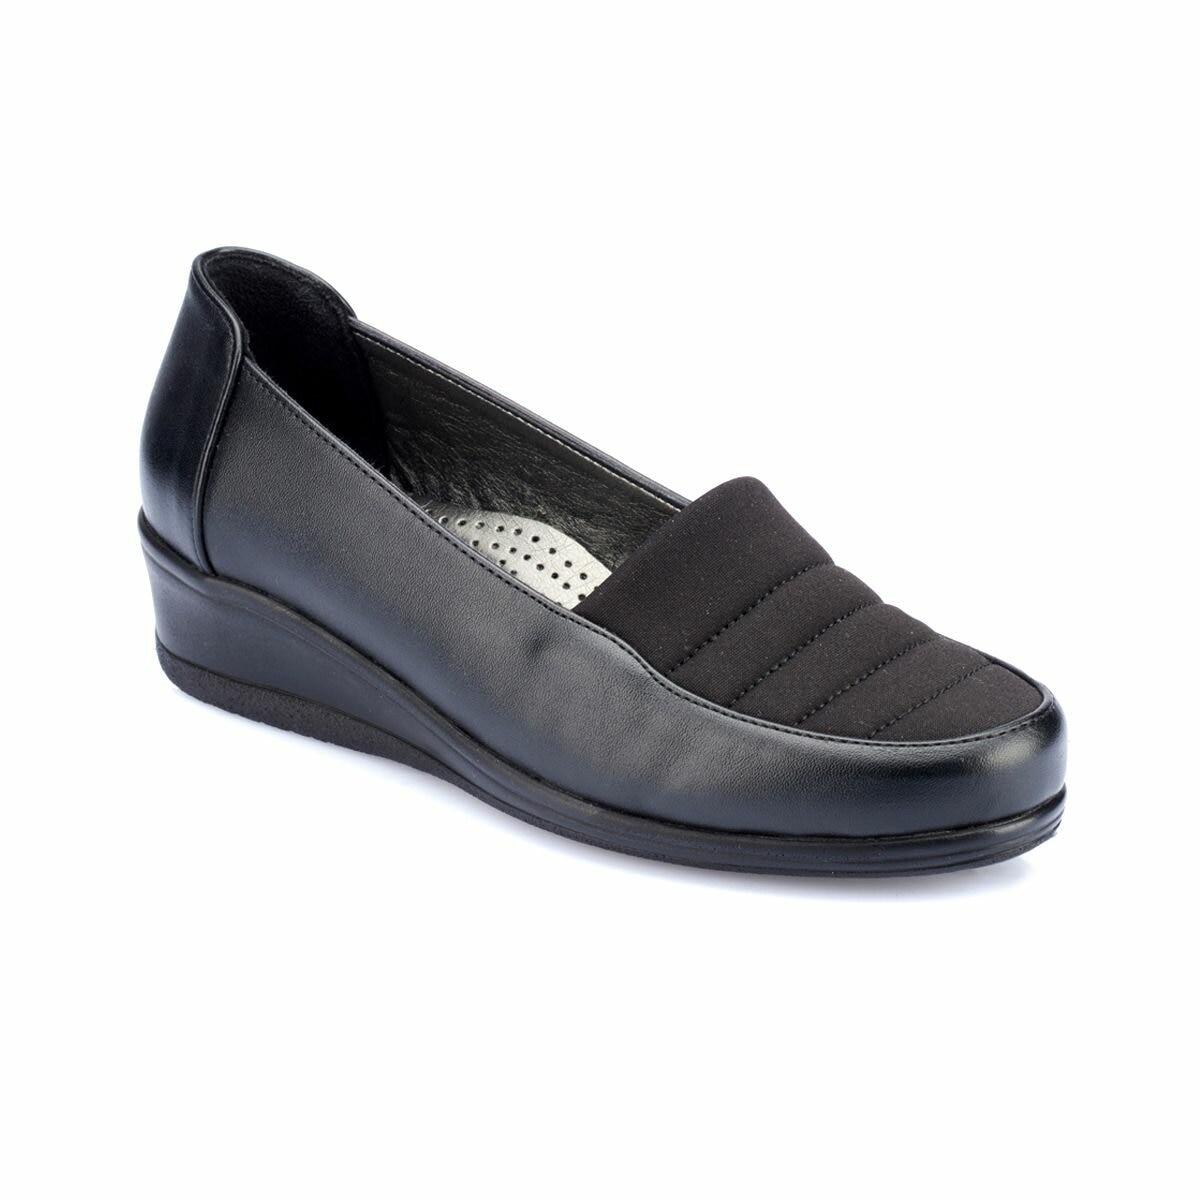 FLO 82.150015.Z Black Women Shoes Polaris